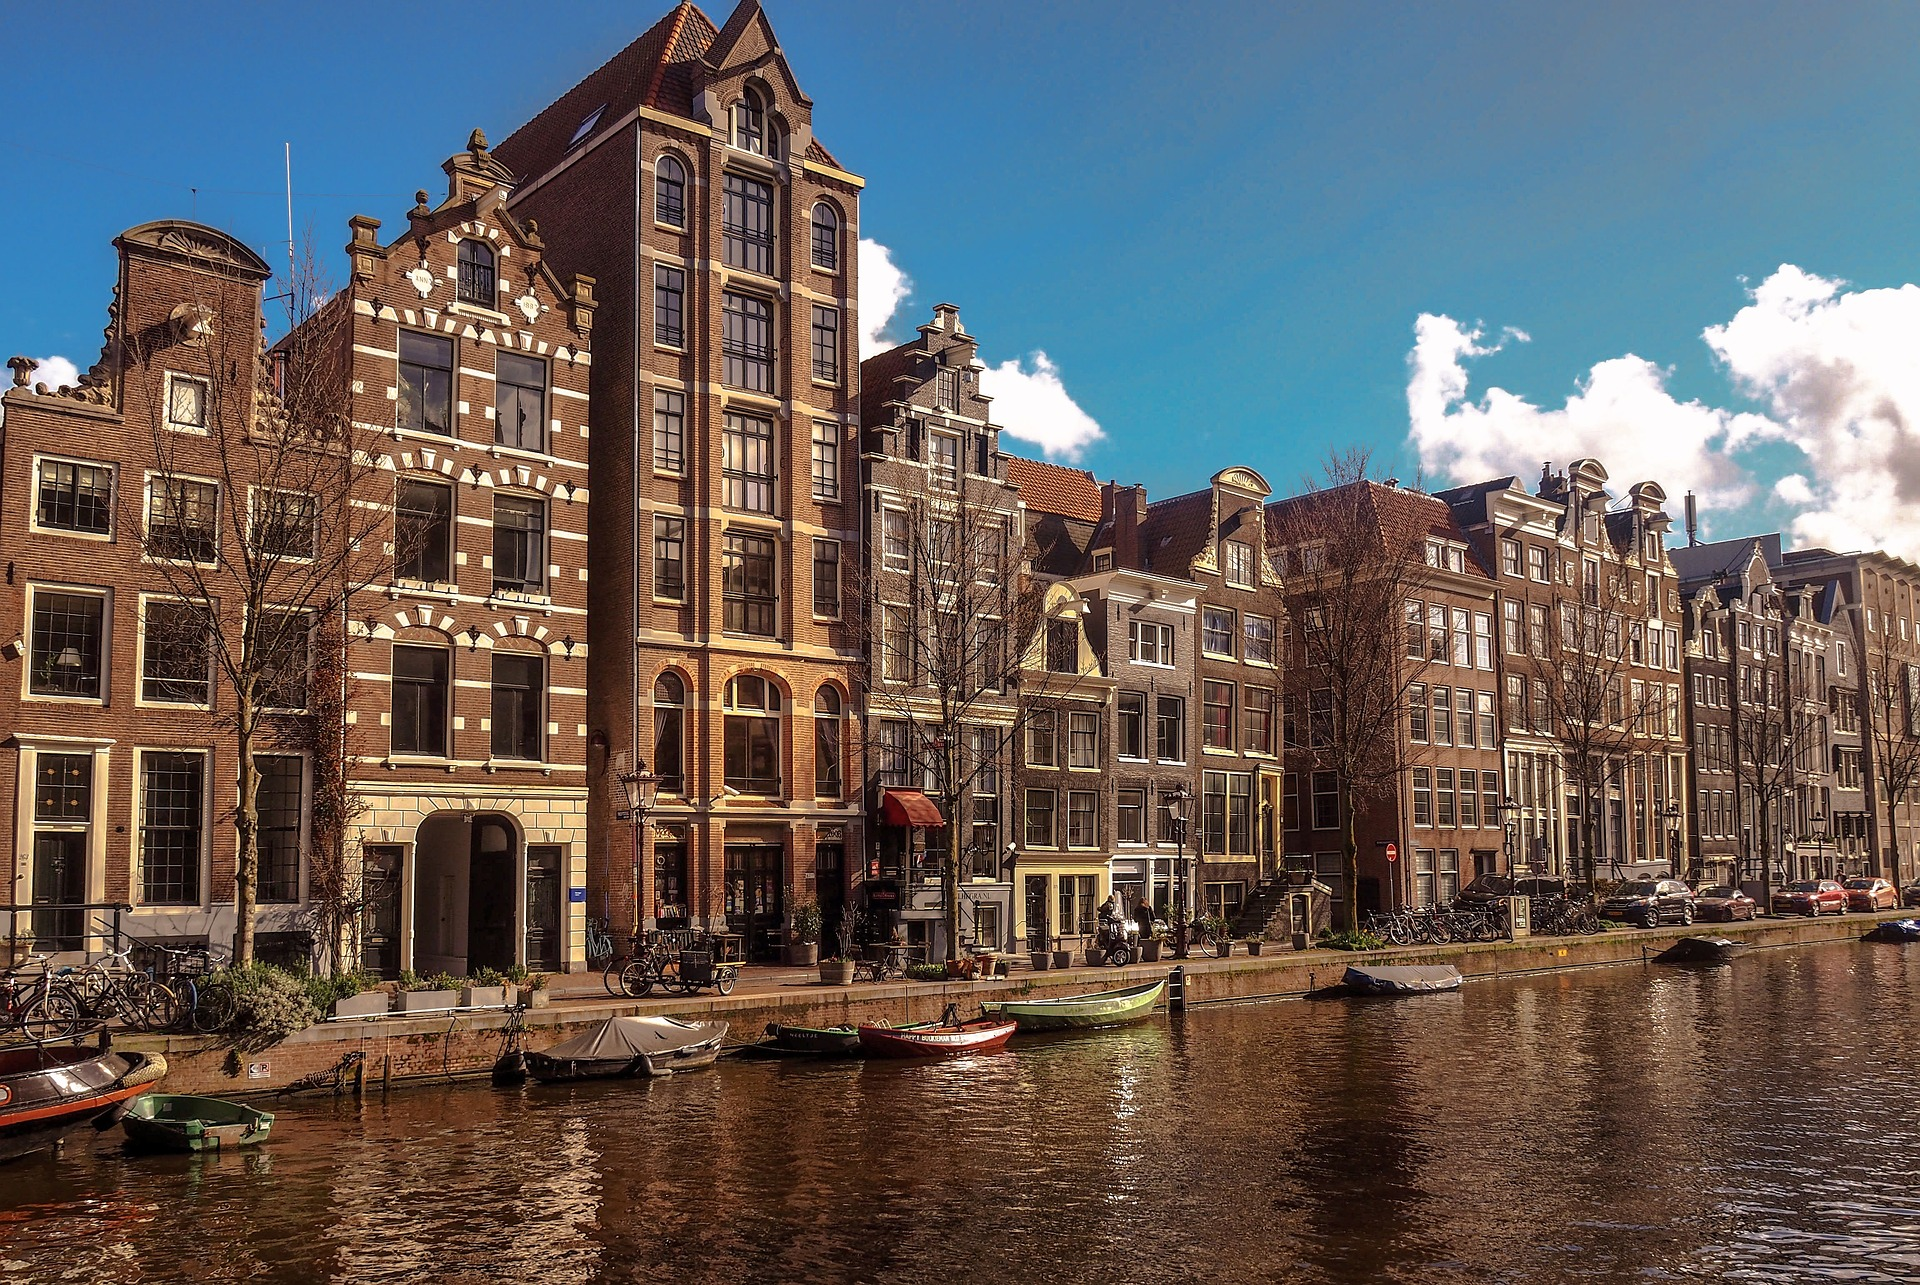 Kijktip: documentaire 'Stil in de Stad' over Amsterdam in coronacrisis